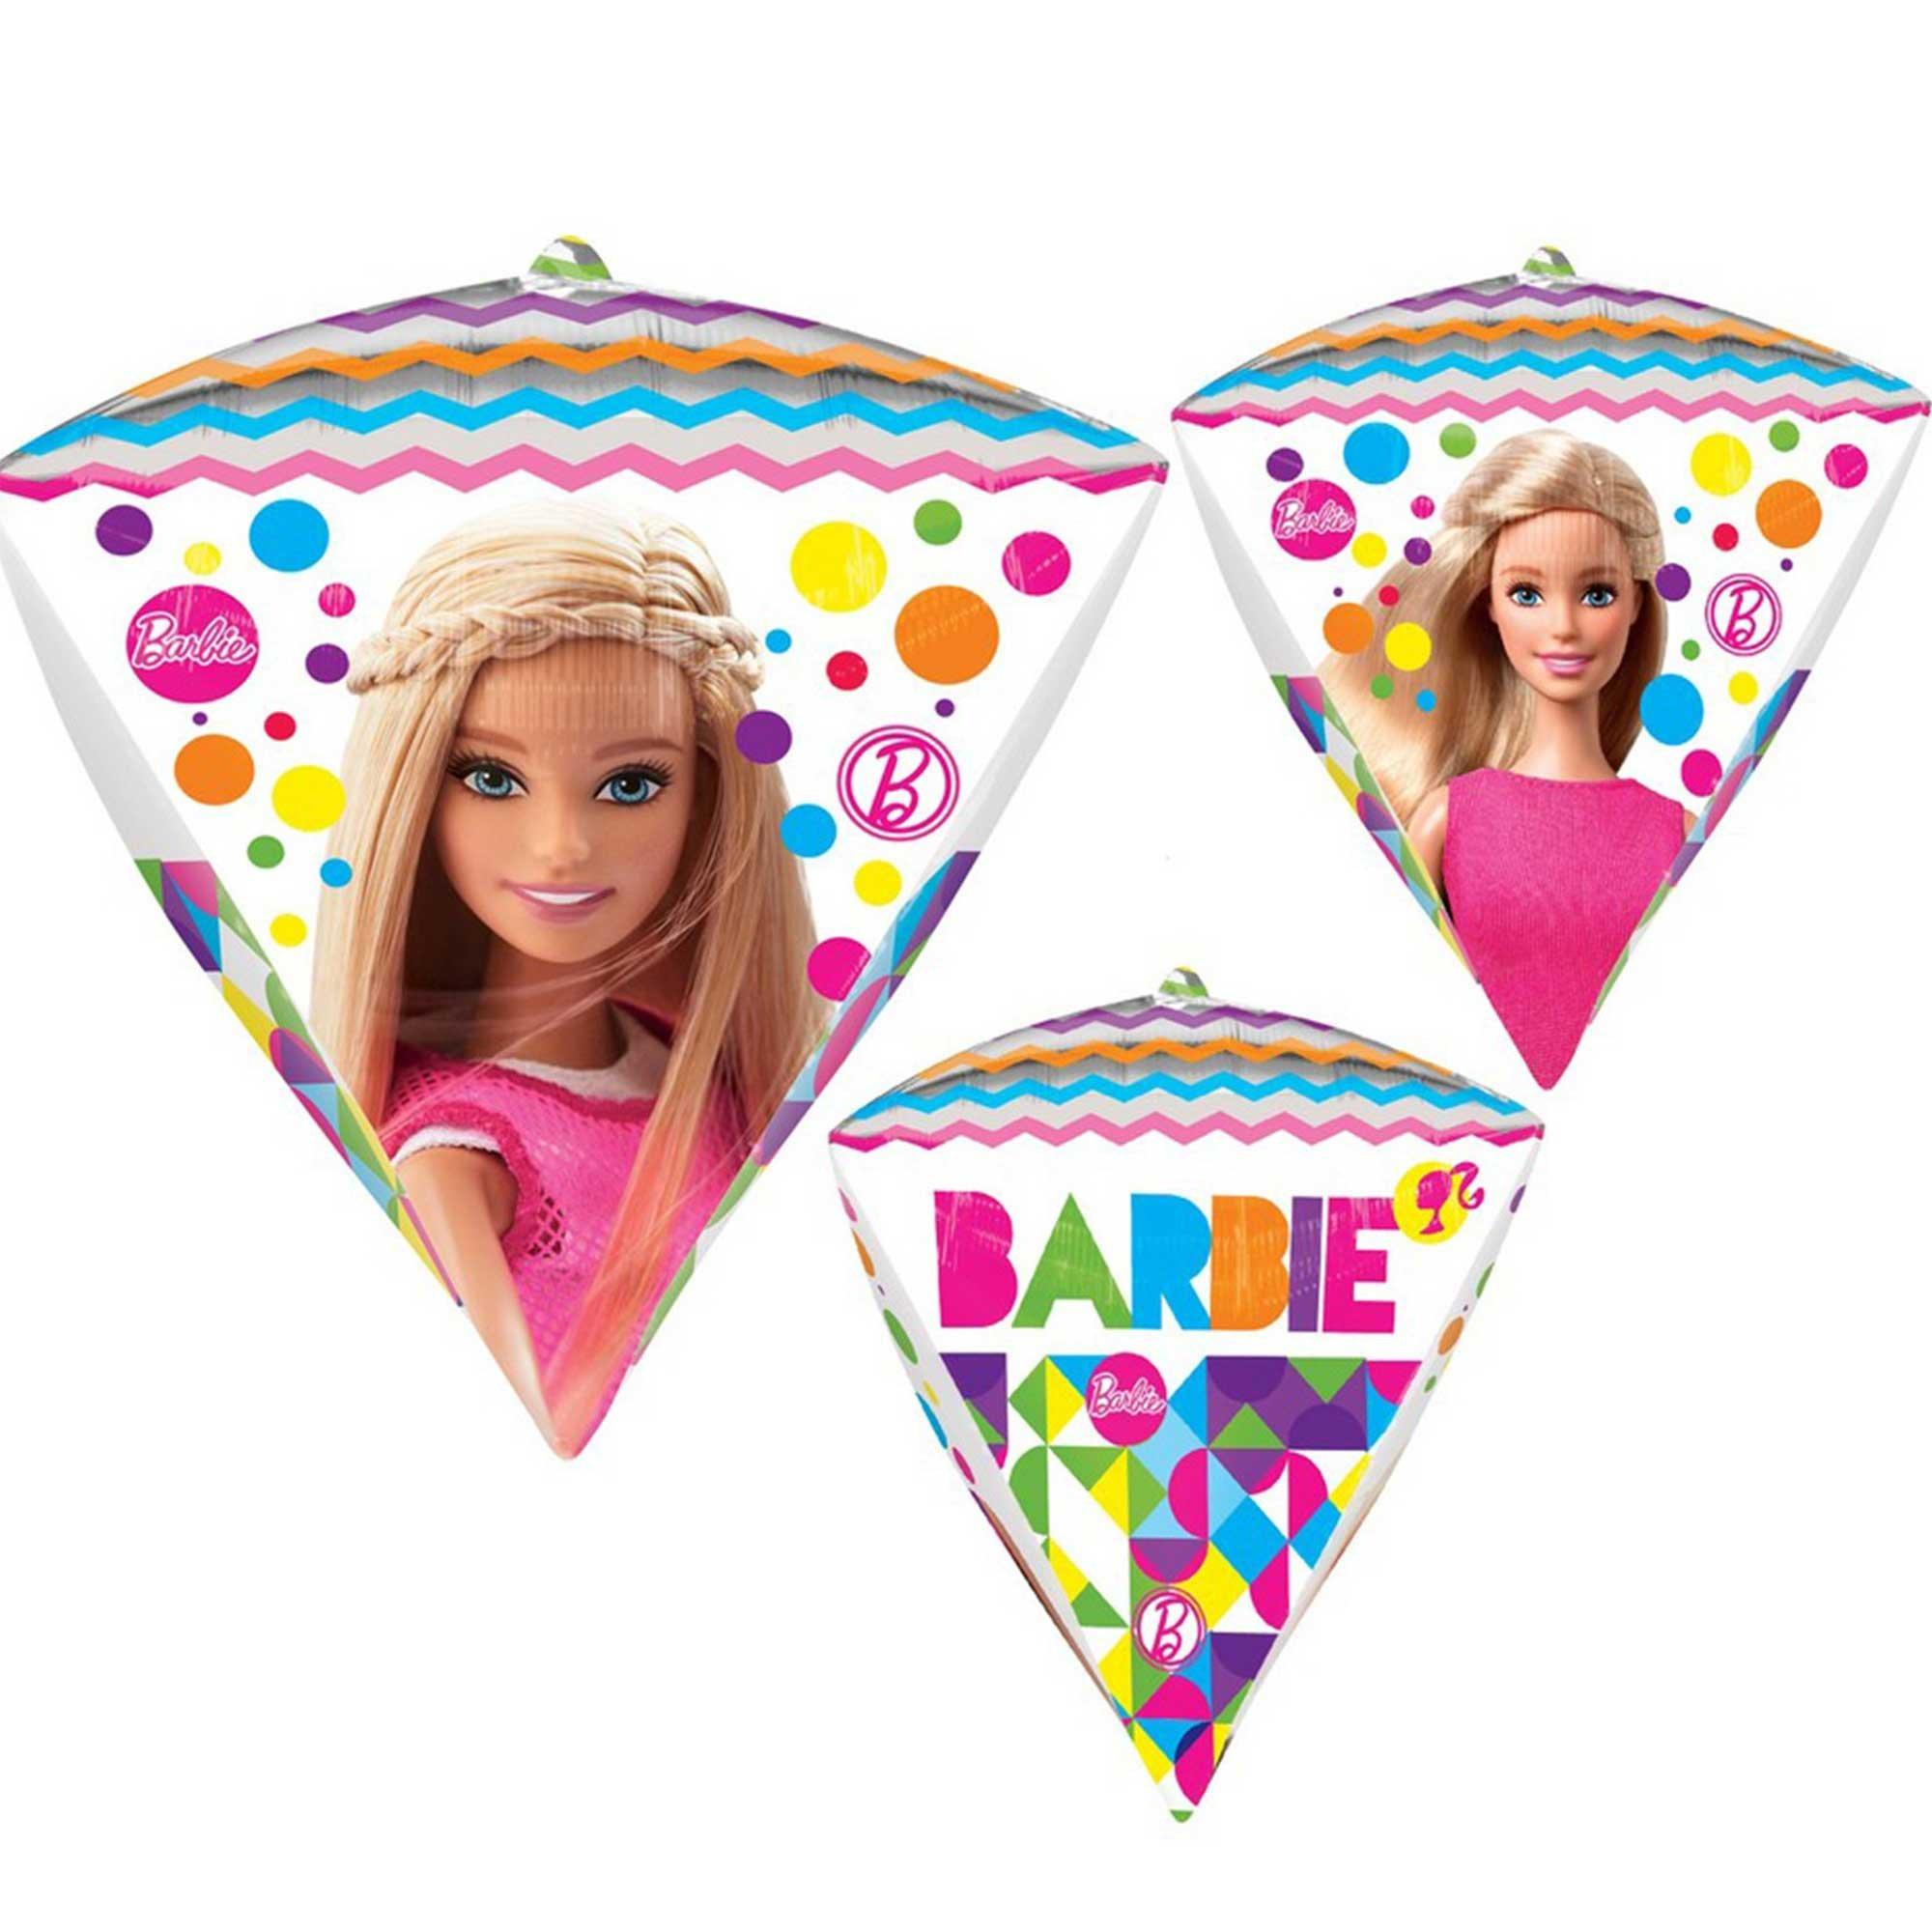 UltraShape Diamondz Barbie Sparkle G40